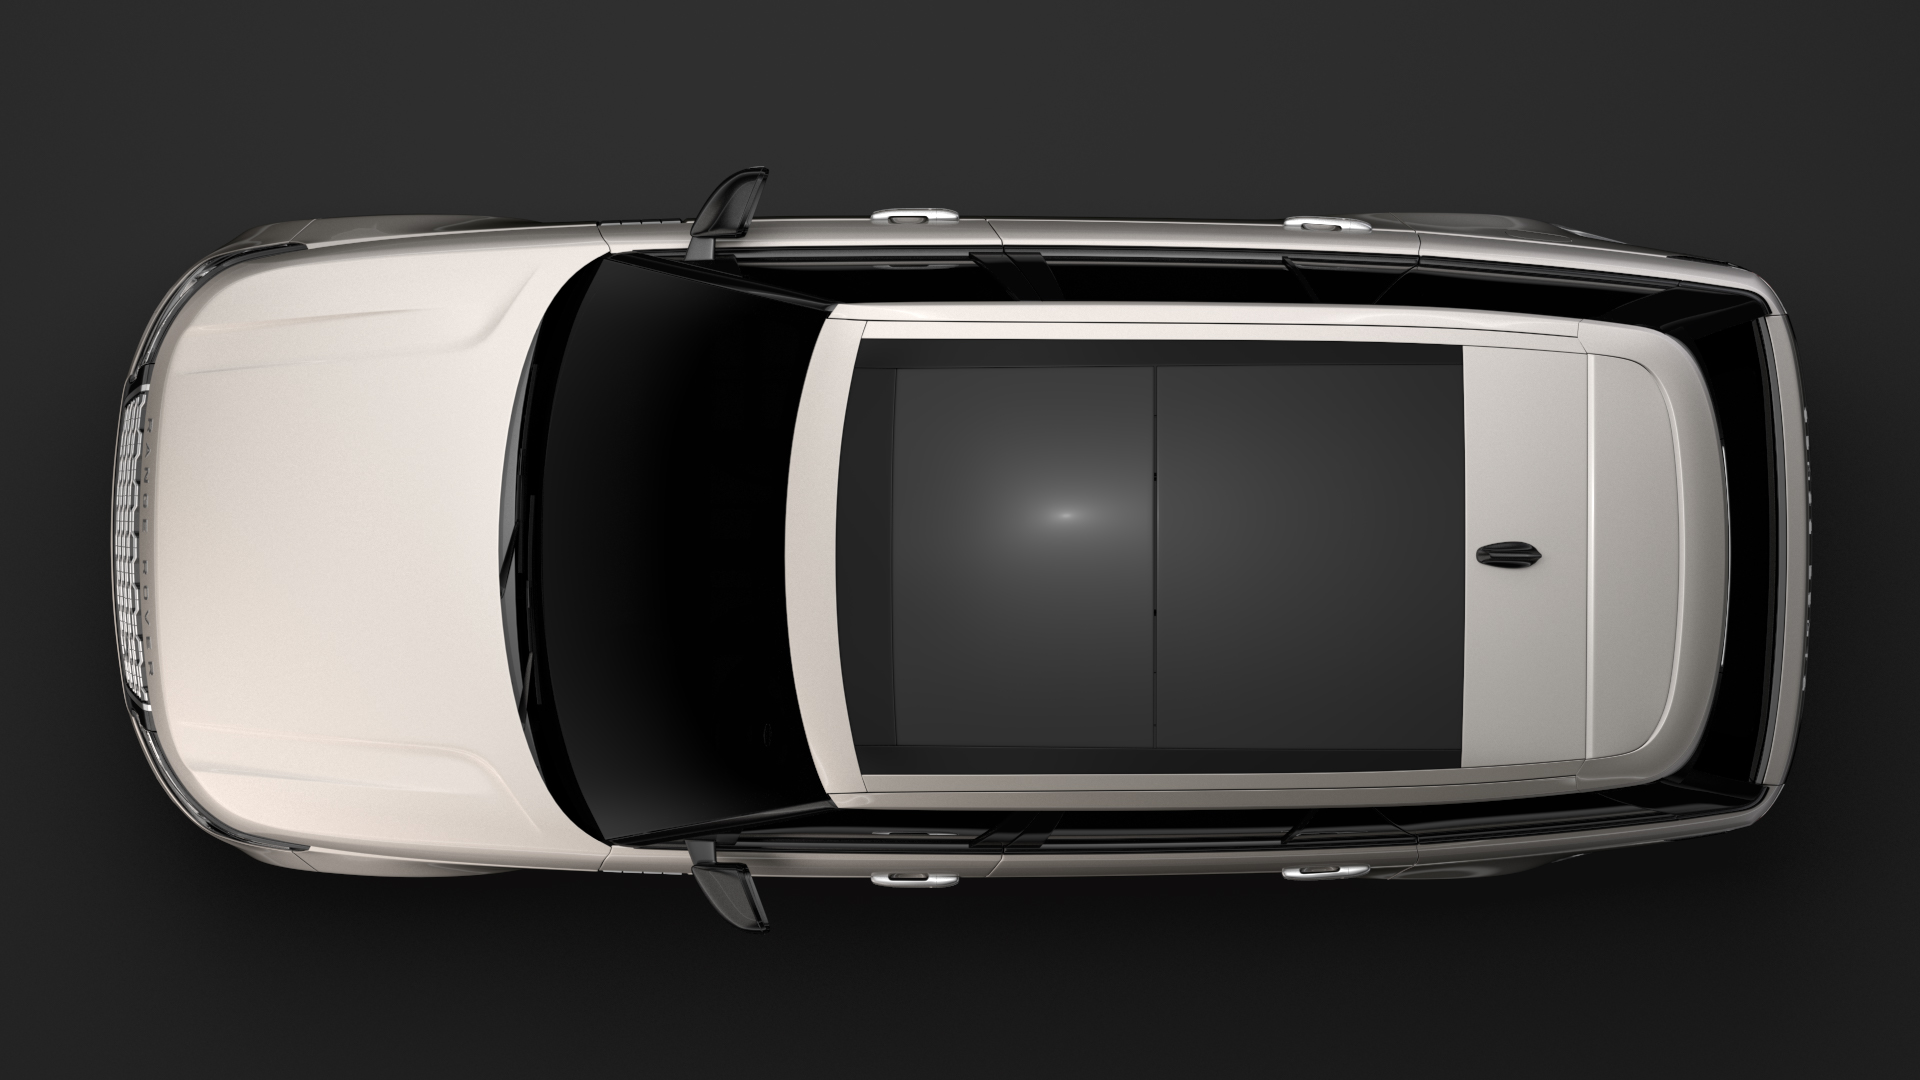 range rover autobiography hybrid lwb l405 2018 3d model max fbx c4d lwo ma mb hrc xsi obj 277303